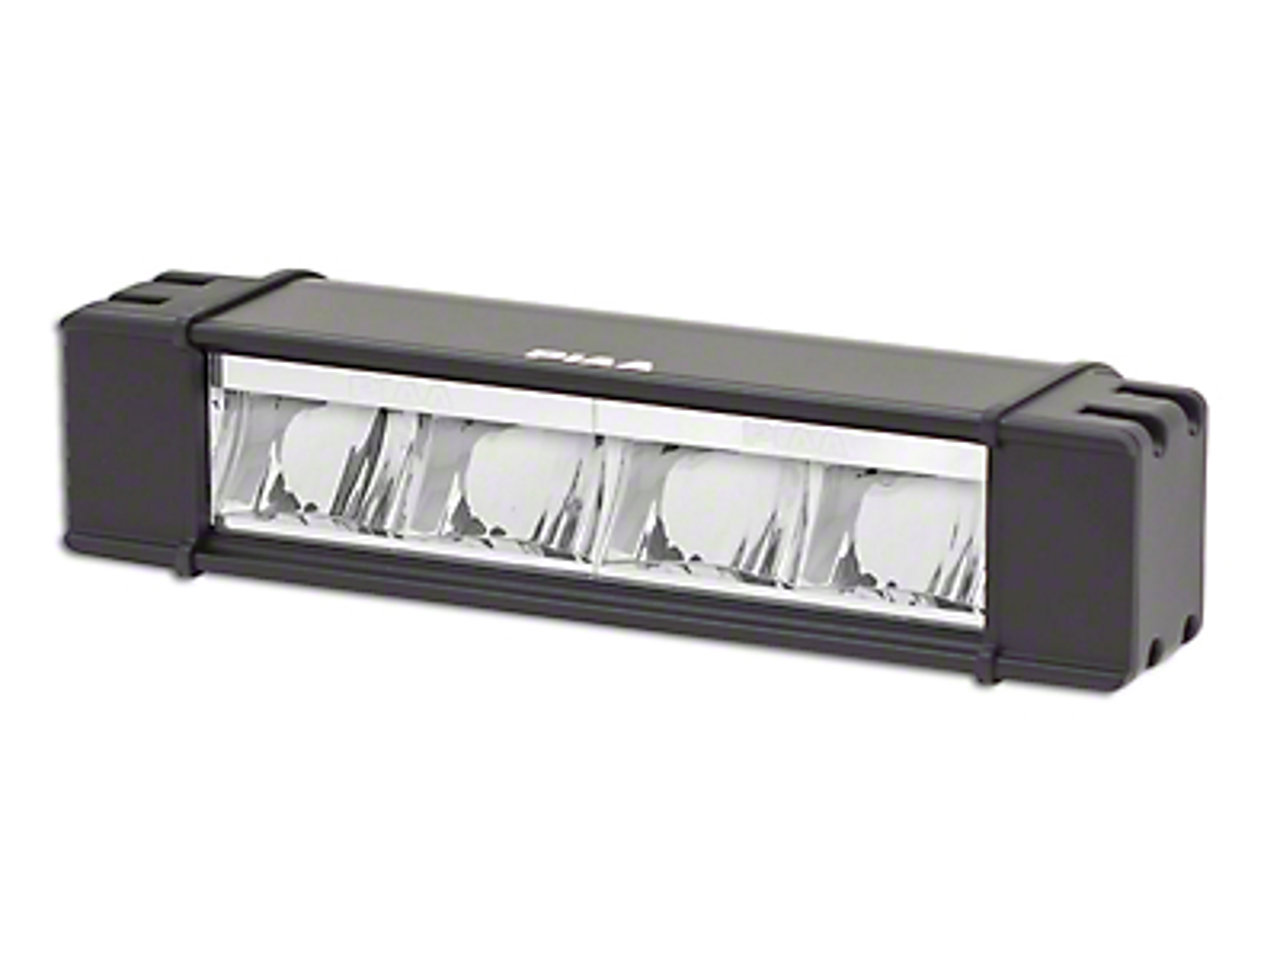 PIAA 10 in. RF Series LED Light Bar - Hybrid Beam (97-18 F-150)